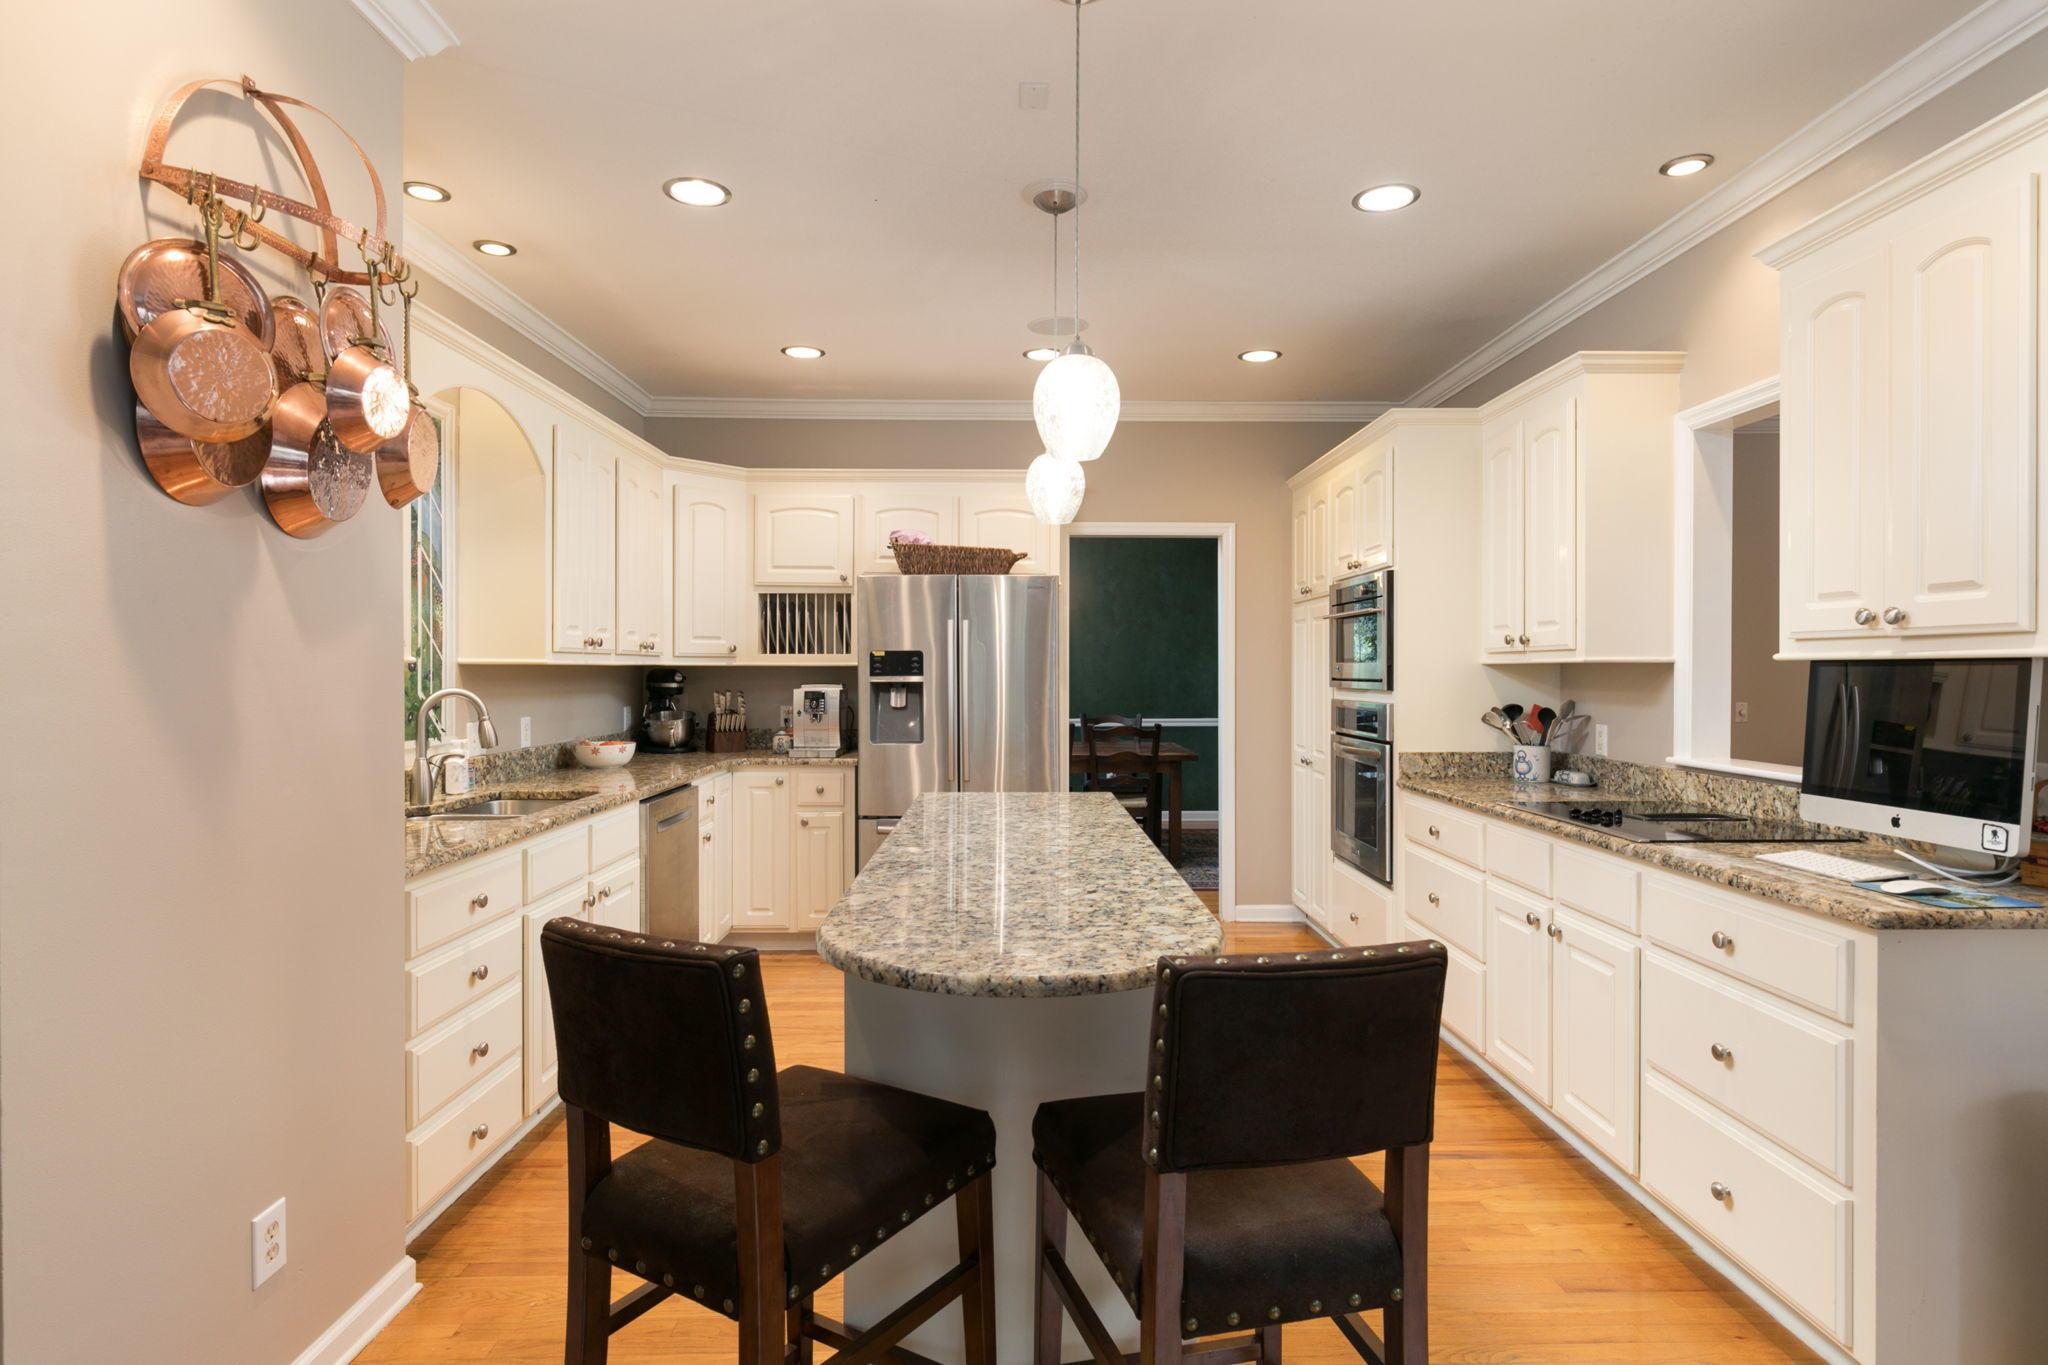 Dunes West Homes For Sale - 3625 Colonel Vanderhorst, Mount Pleasant, SC - 18